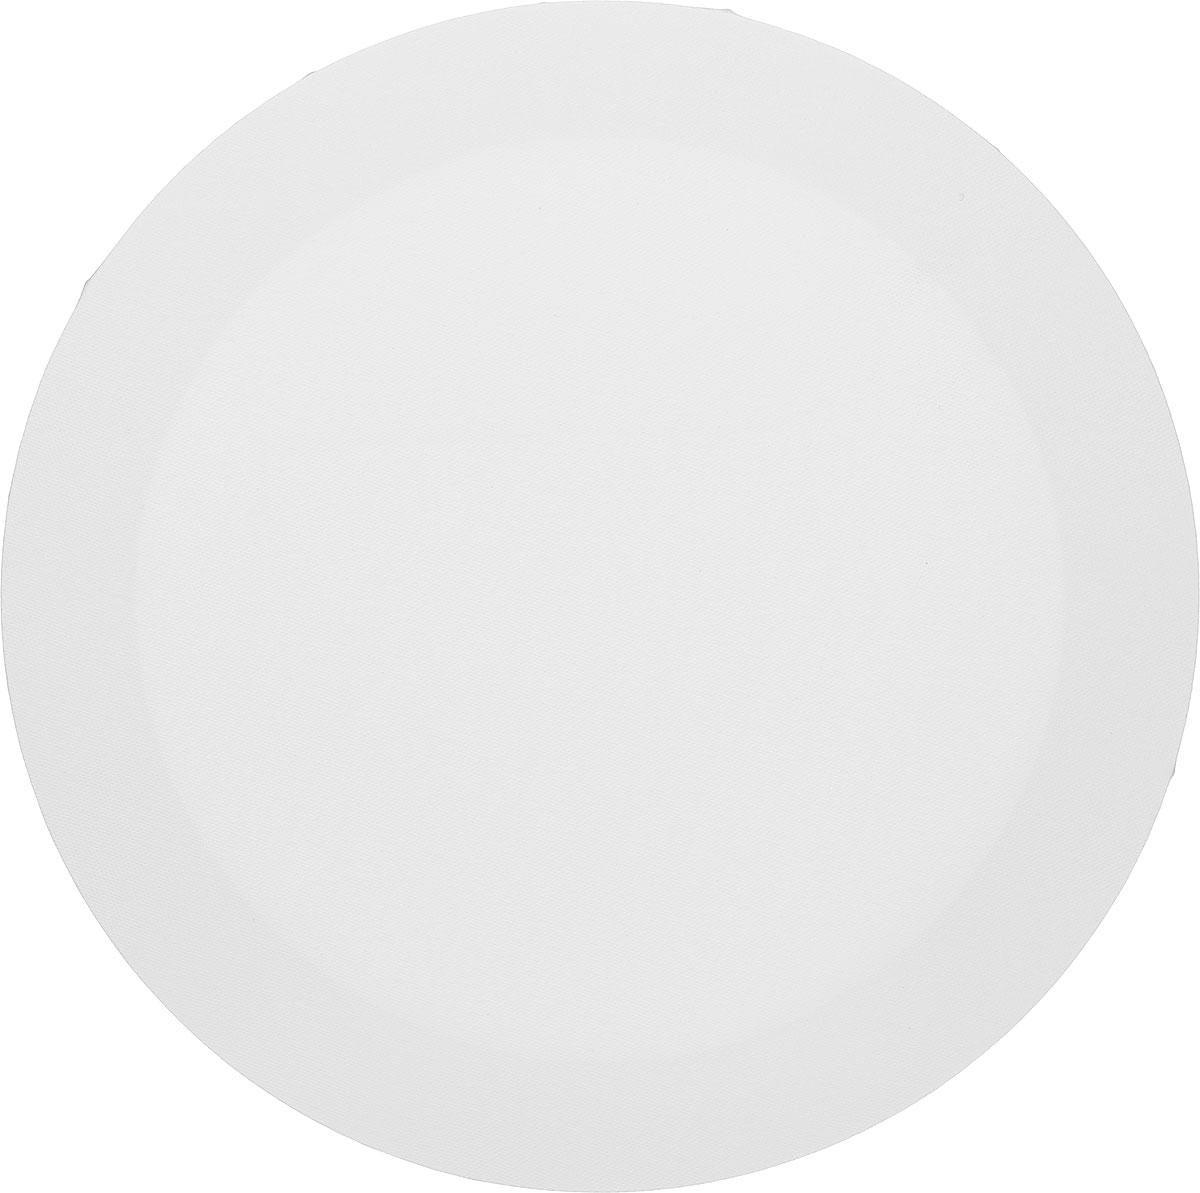 Малевичъ Холст на подрамнике круглый диаметр 40 см 380 г/м2, Малевичь